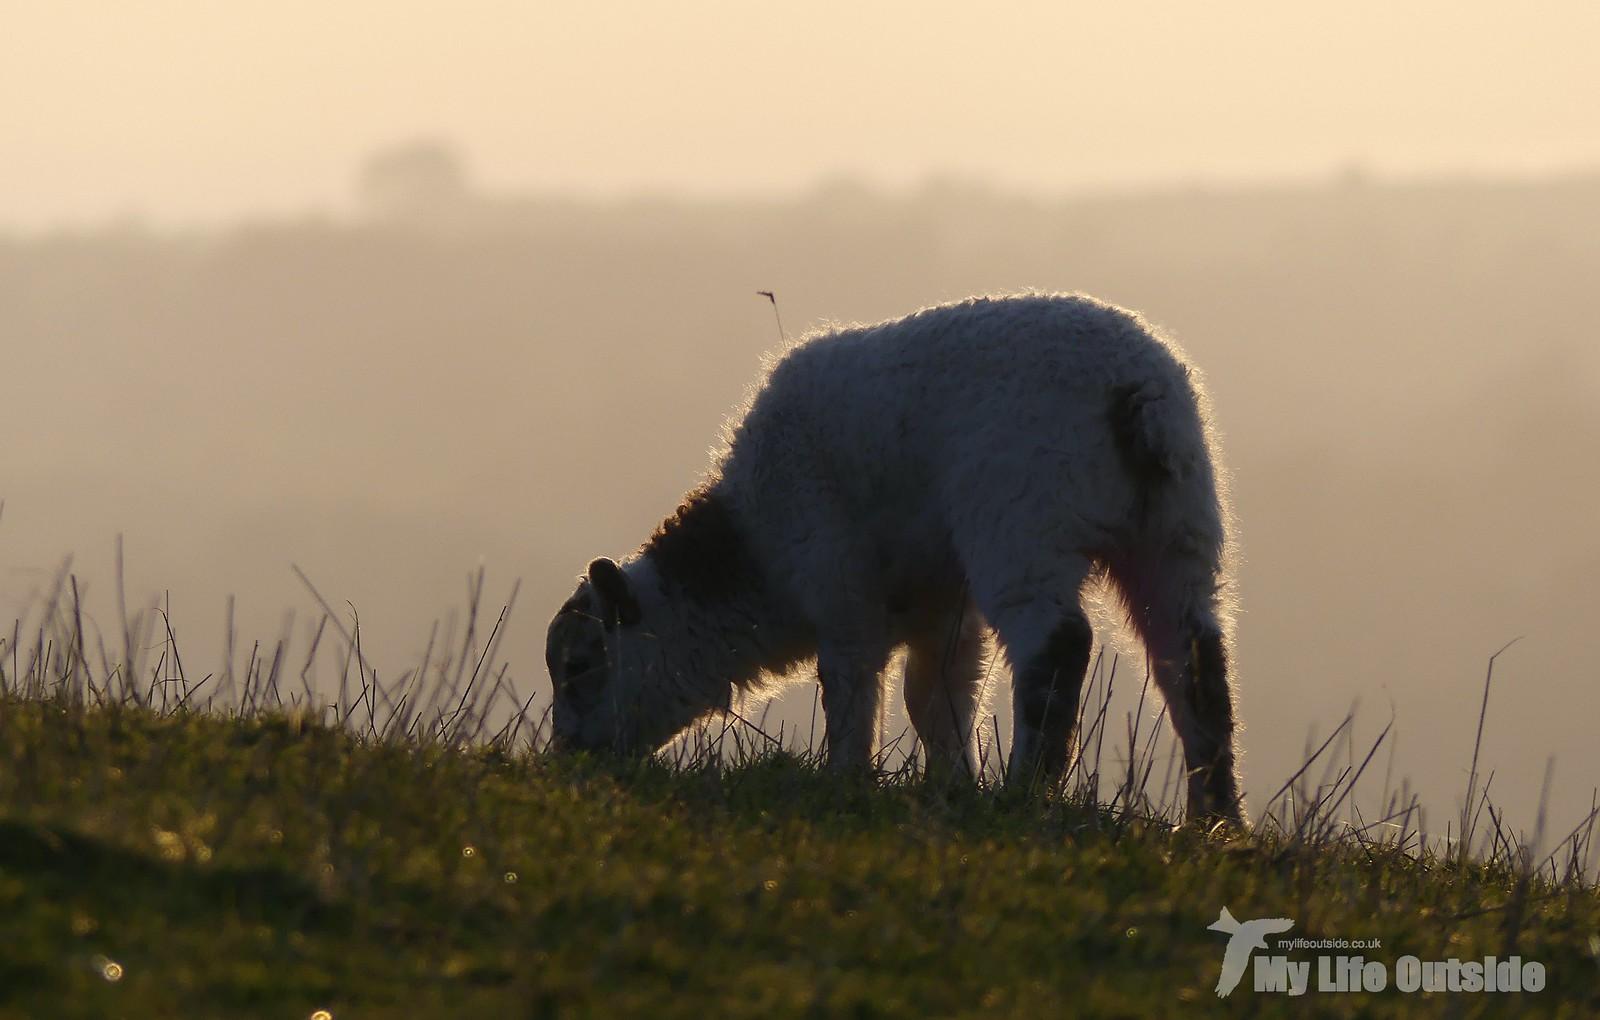 P1240129 - Lambs at sunset